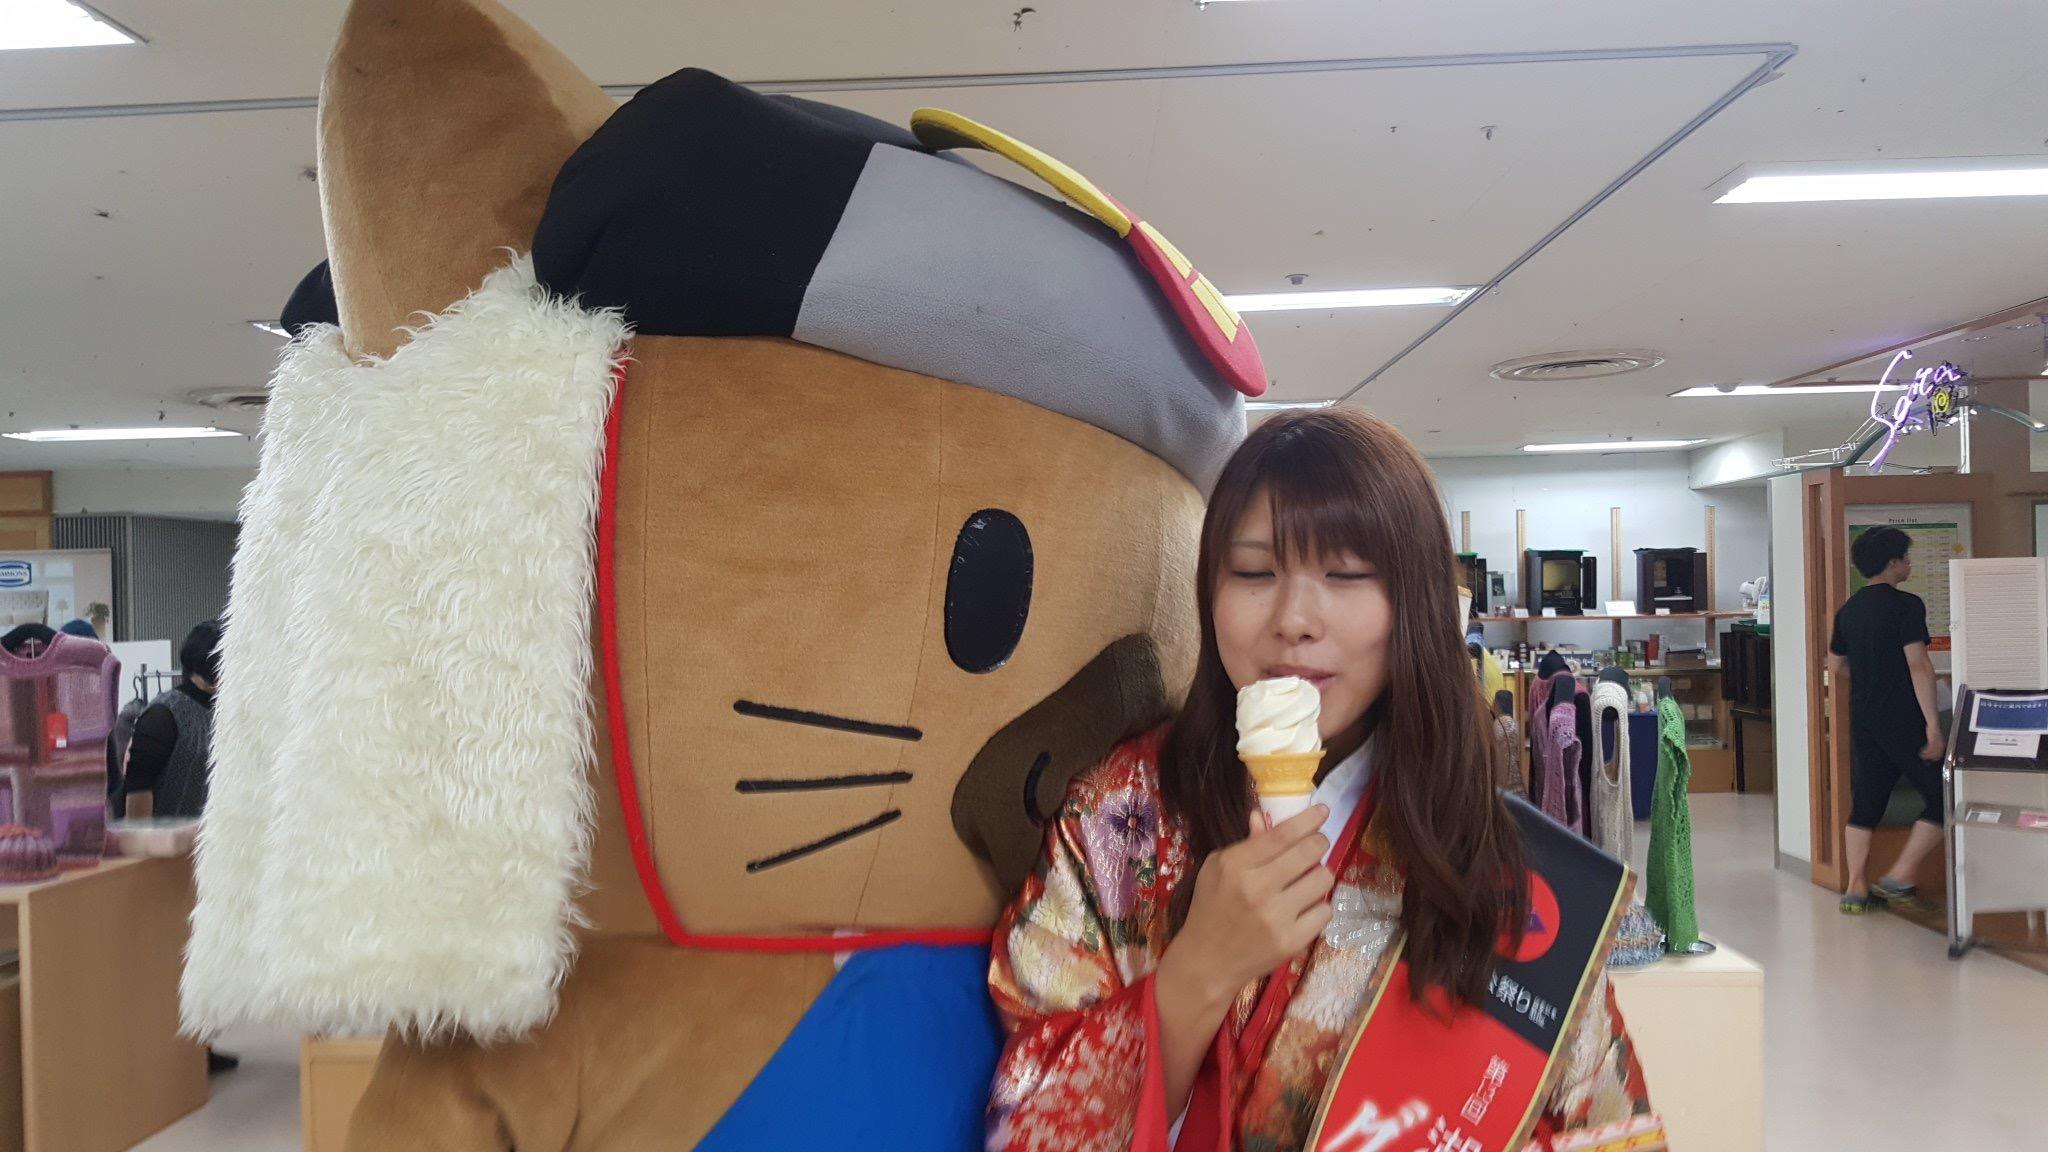 http://www.yamanashi-kankou.jp/blog/%E5%86%99%E7%9C%9F%202016-09-02%2016%2013%2045.jpg